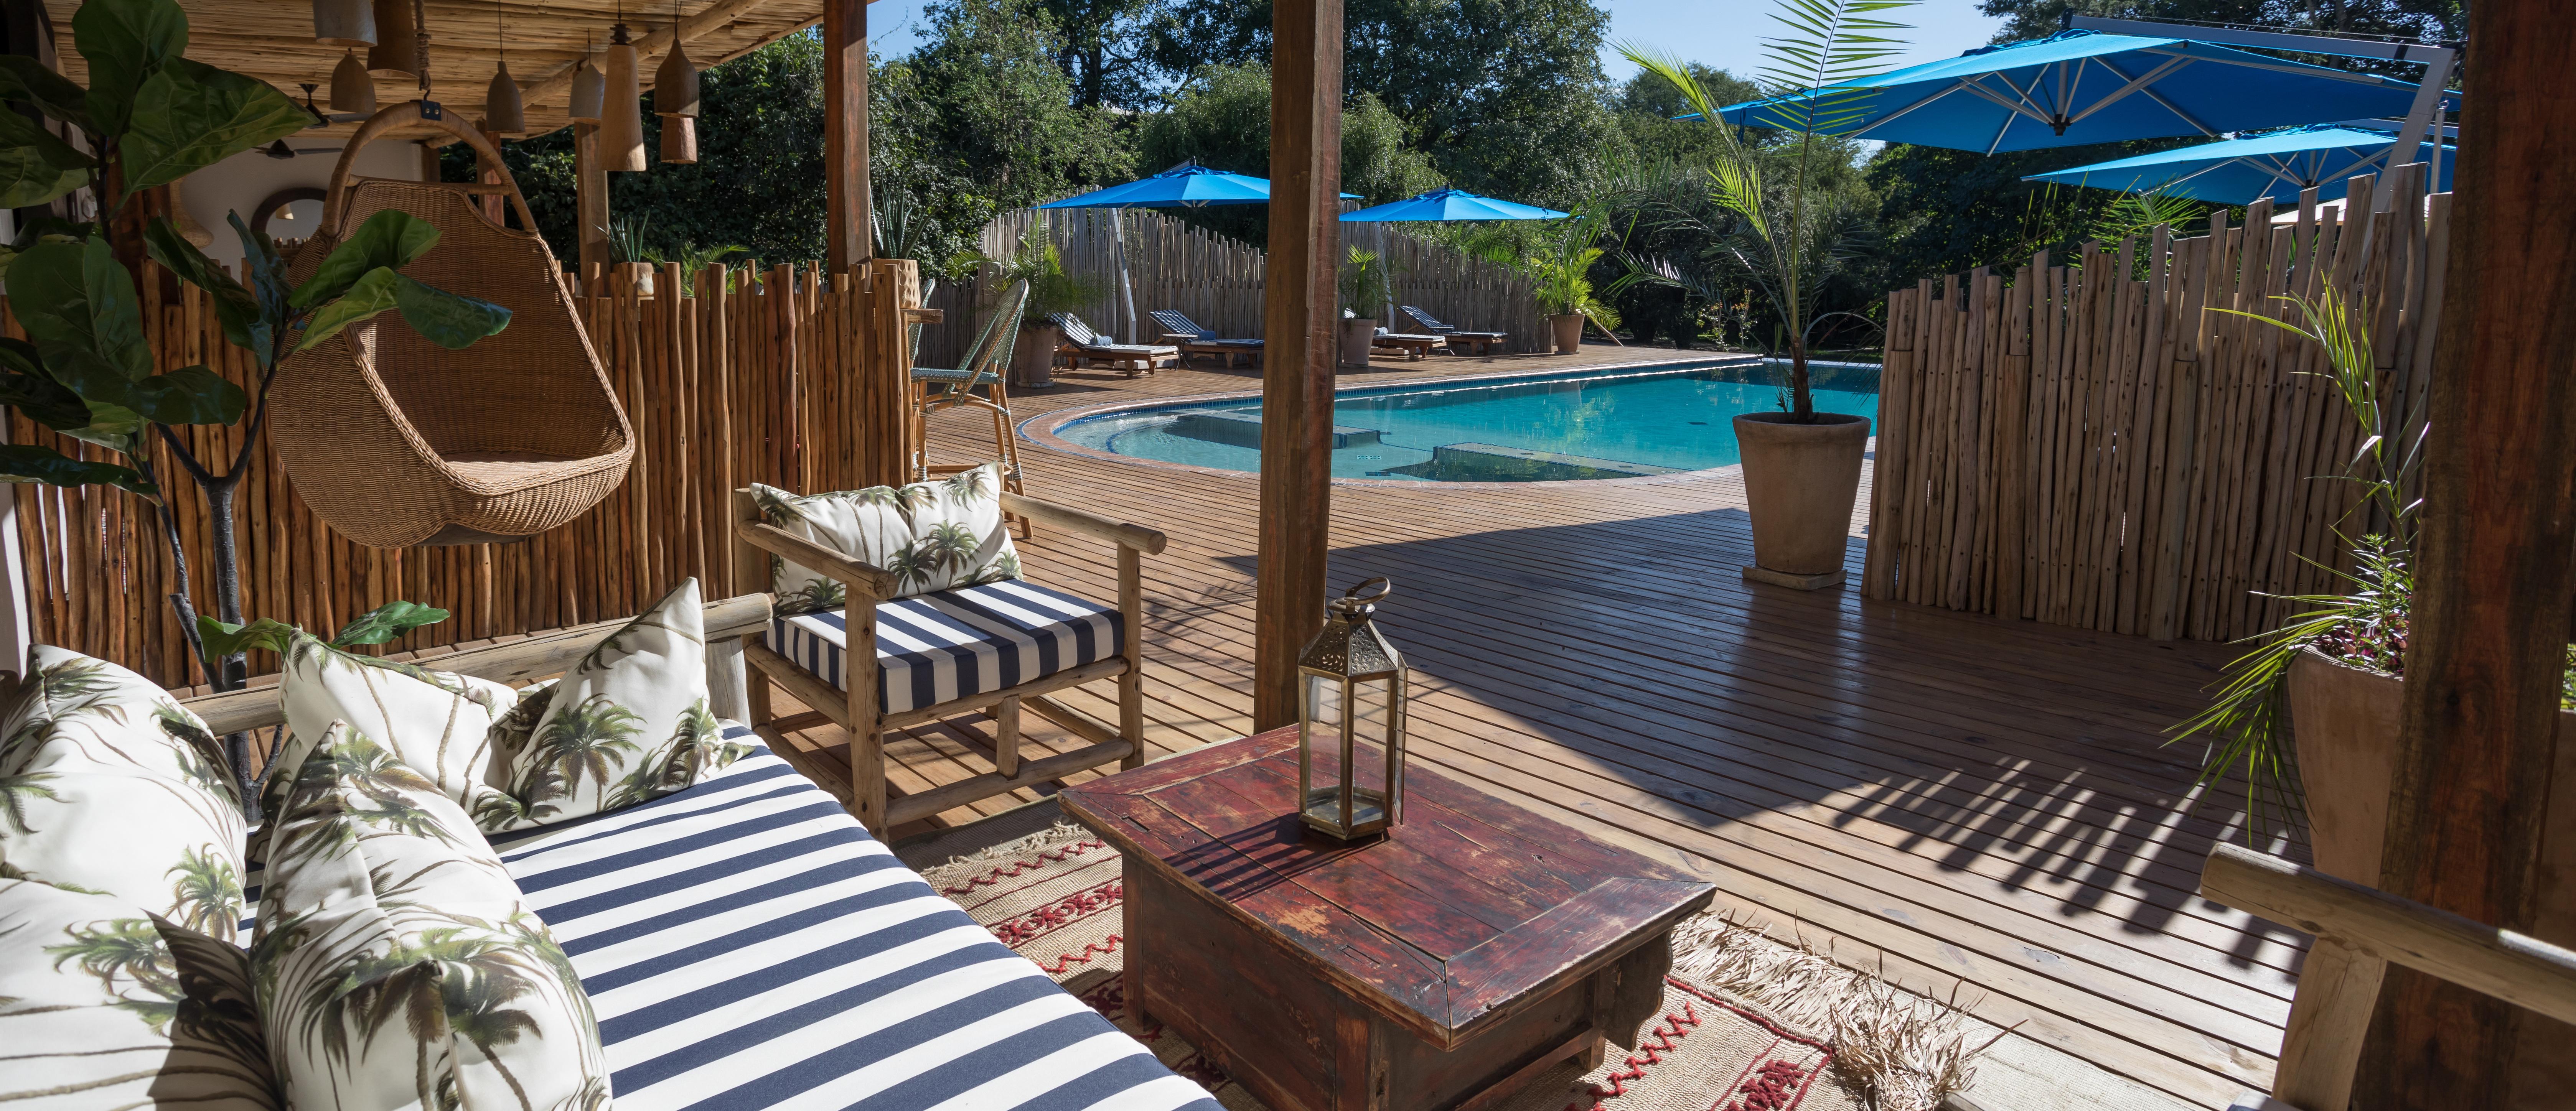 Tongabezi-lodge-lap-pool